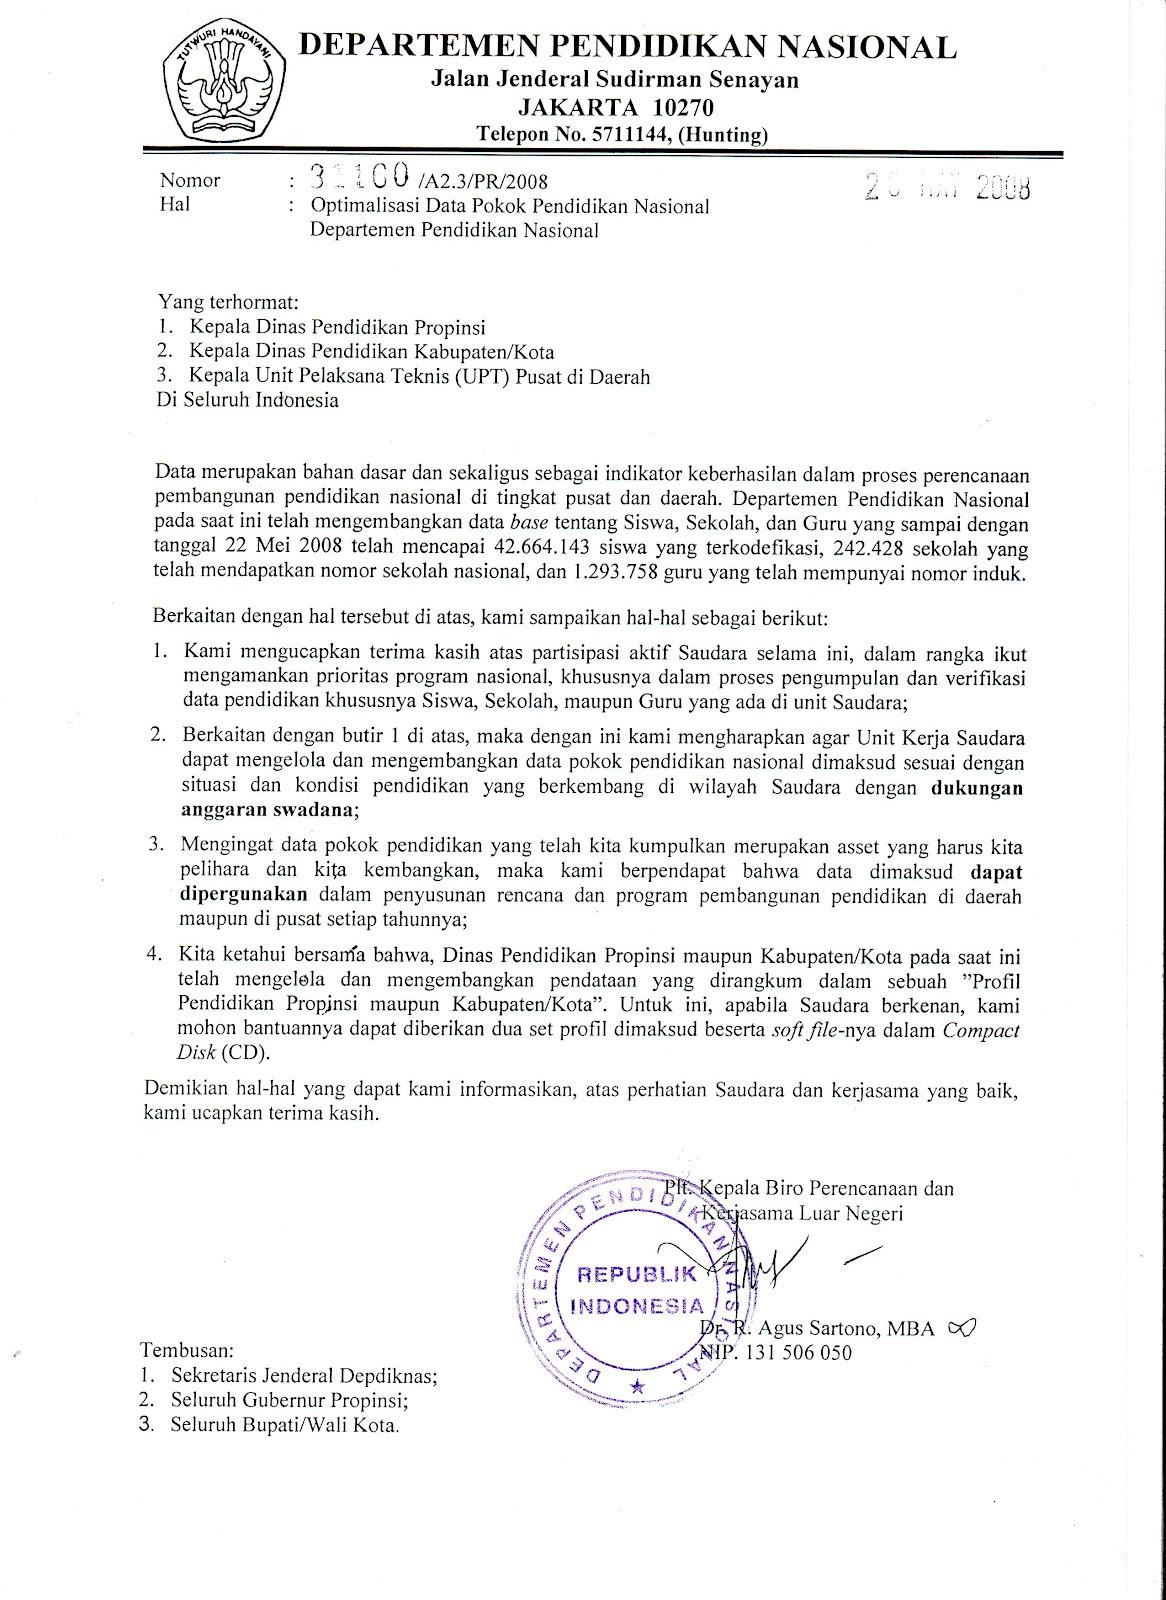 100% Teater Djiwo: Contoh Surat Pernyataan yang Baik ...